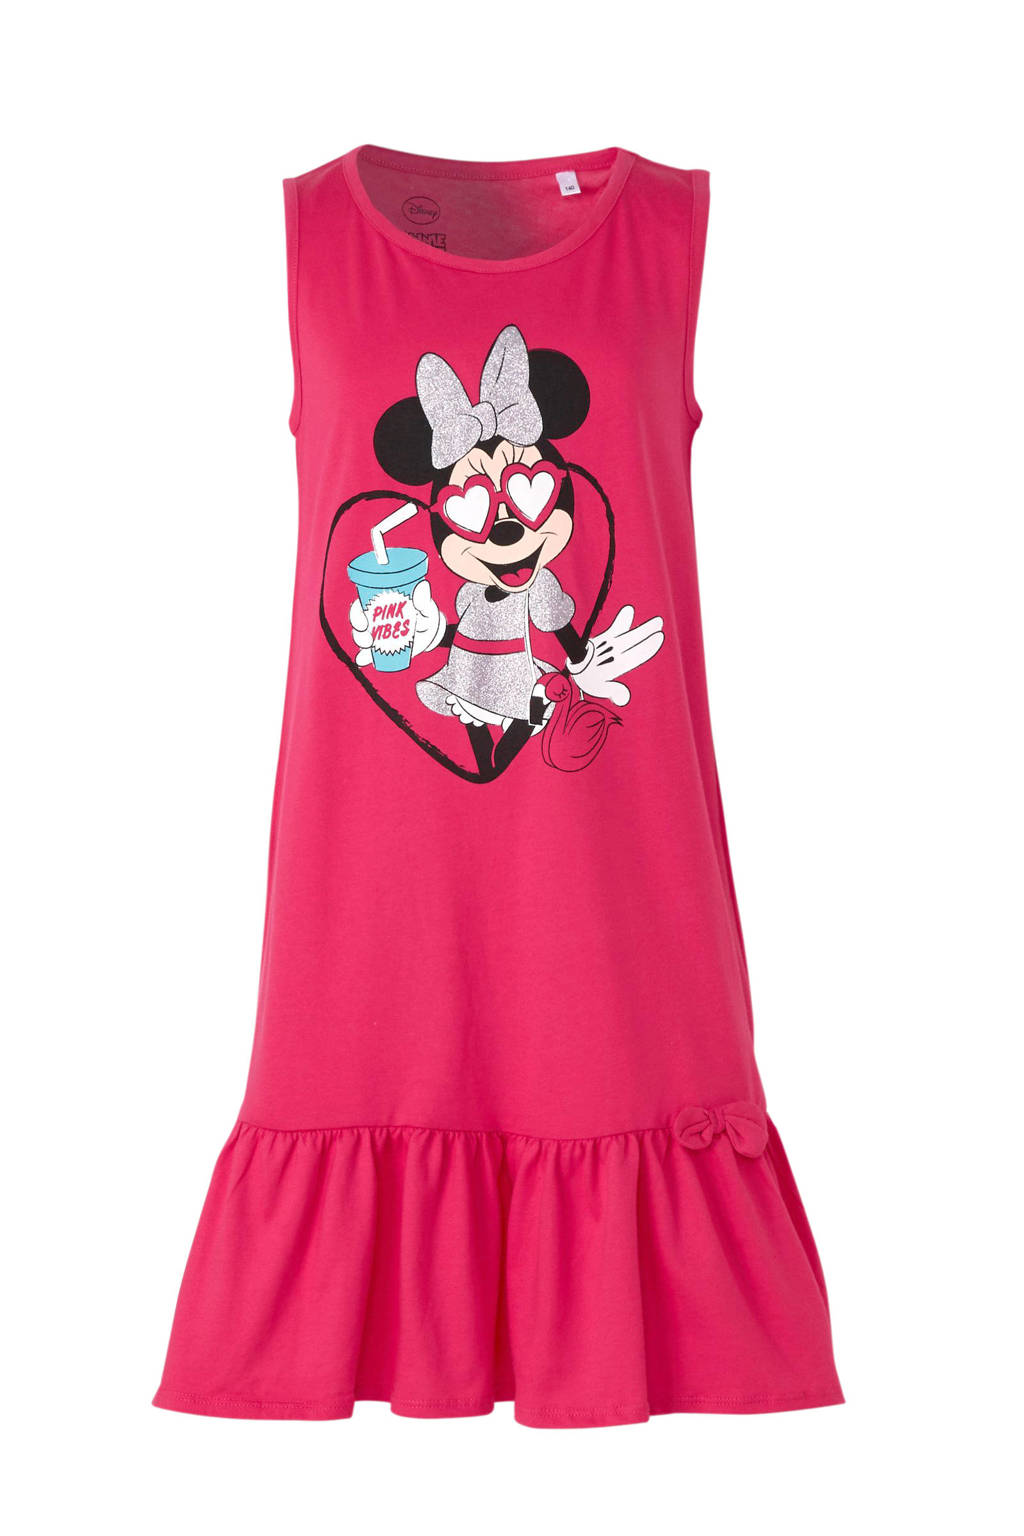 Disney @ C&A Minnie Mouse jurk - set van 2, Roze/wit